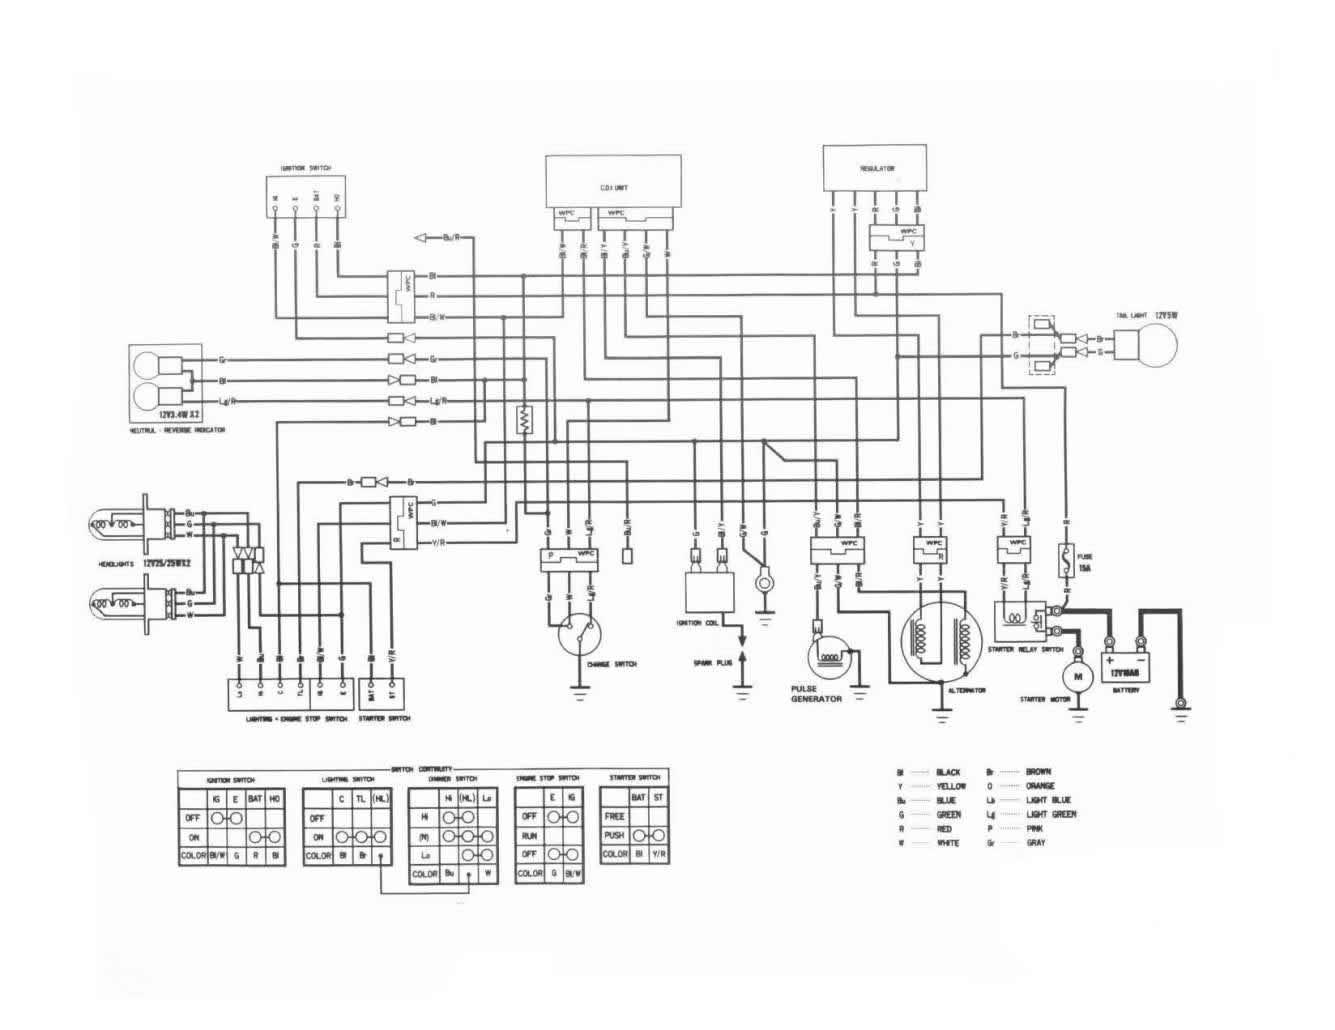 83 Honda 250 3 Wheeler Engine Diagram besides 1985 Klt 200 Wiring Diagram further 187 Honda Wiring Diagram Section as well Generator Fuel Tank Valve in addition Wiring Diagram Honda Spree. on honda atc 200s engine